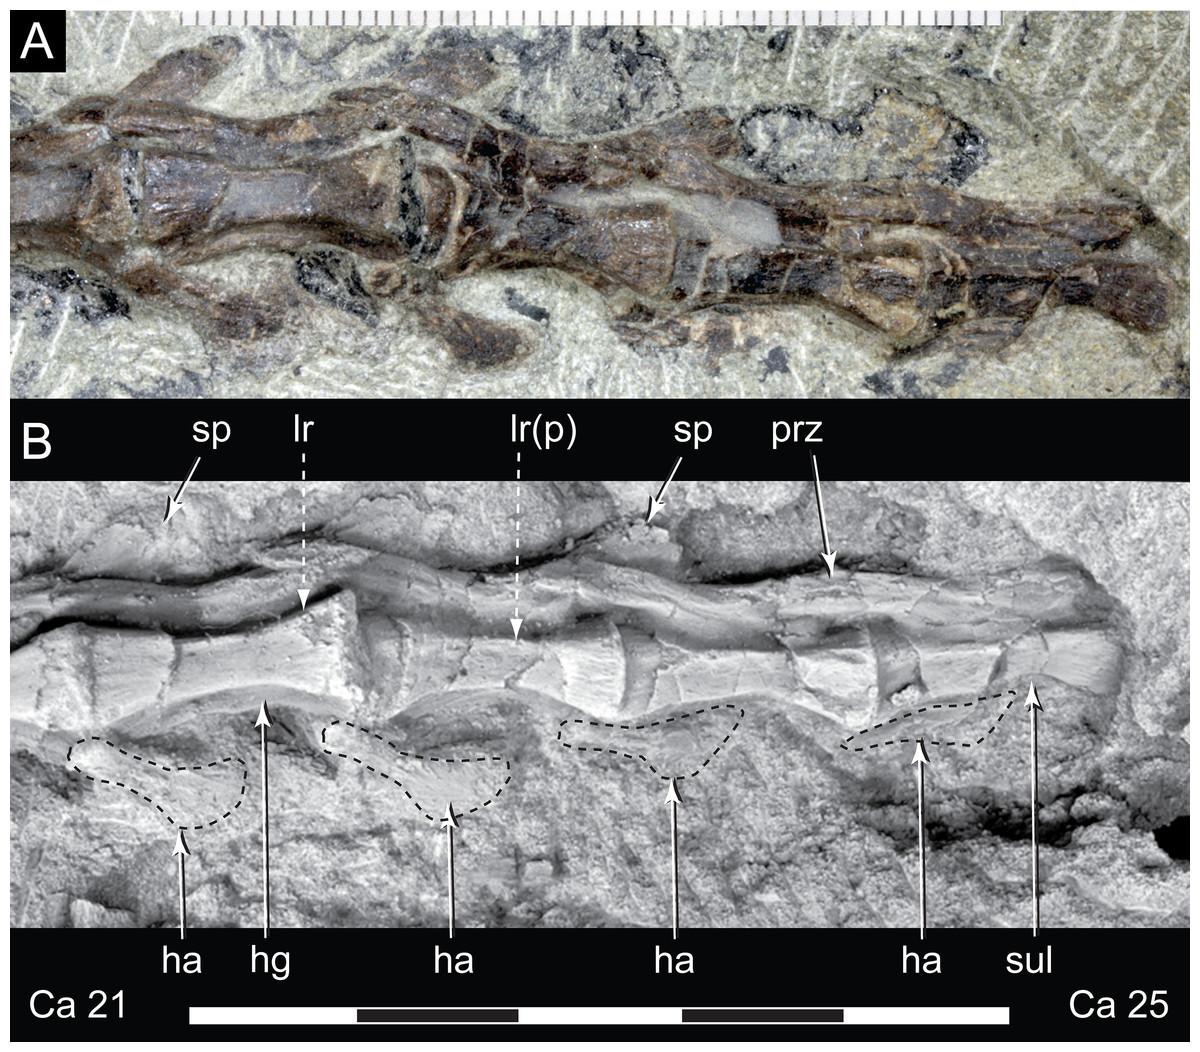 A new small-bodied ornithopod (Dinosauria, Ornithischia